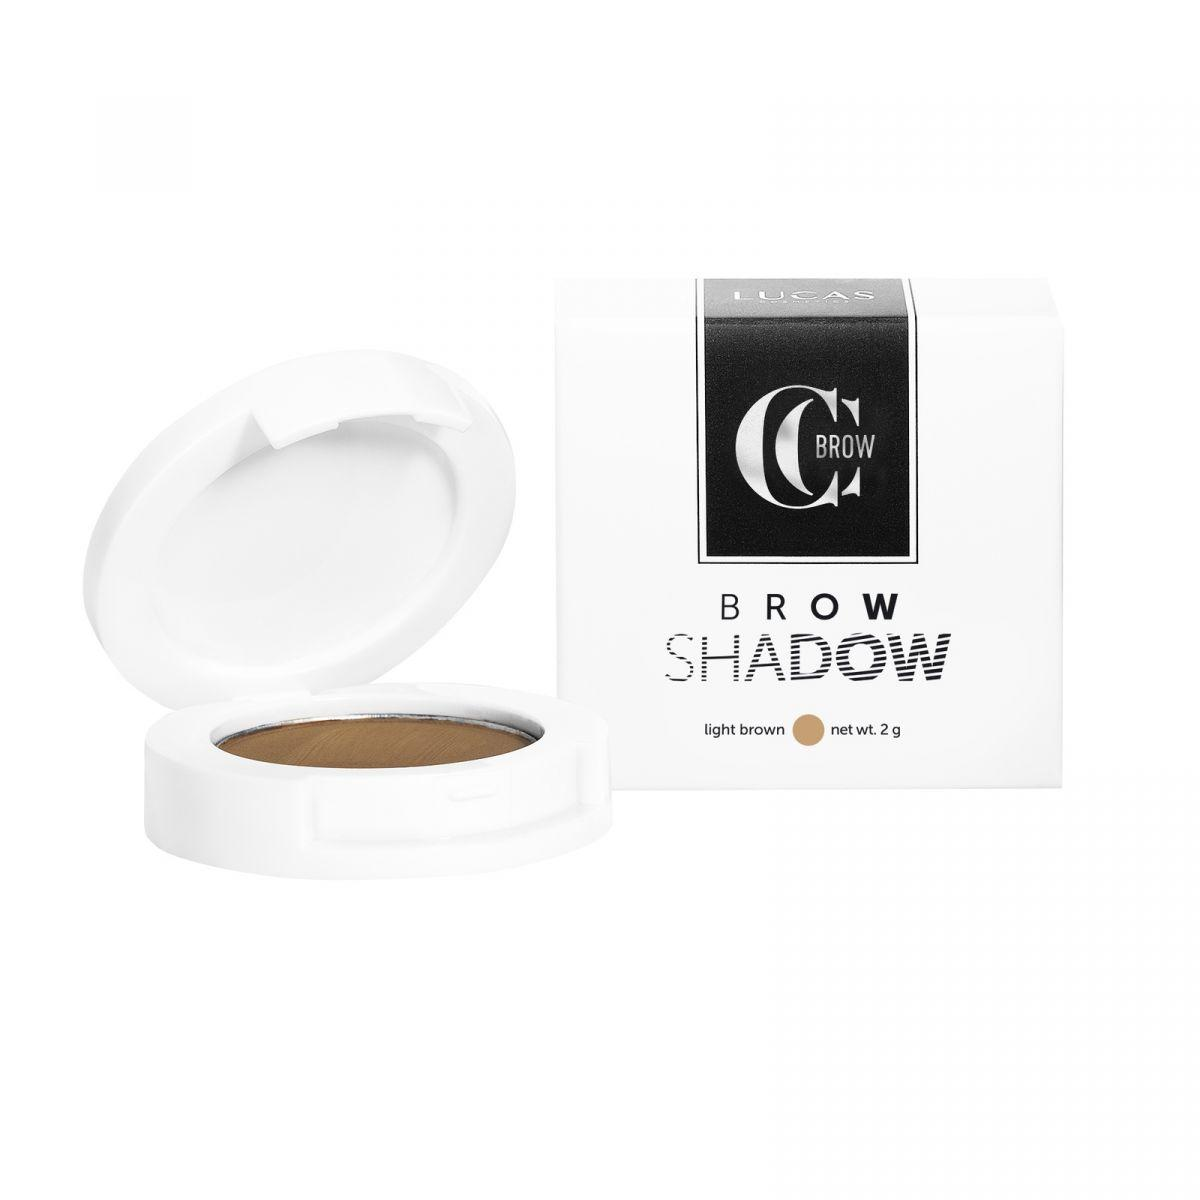 Тени для бровей Brow Shadow by CC Brow (Русый)